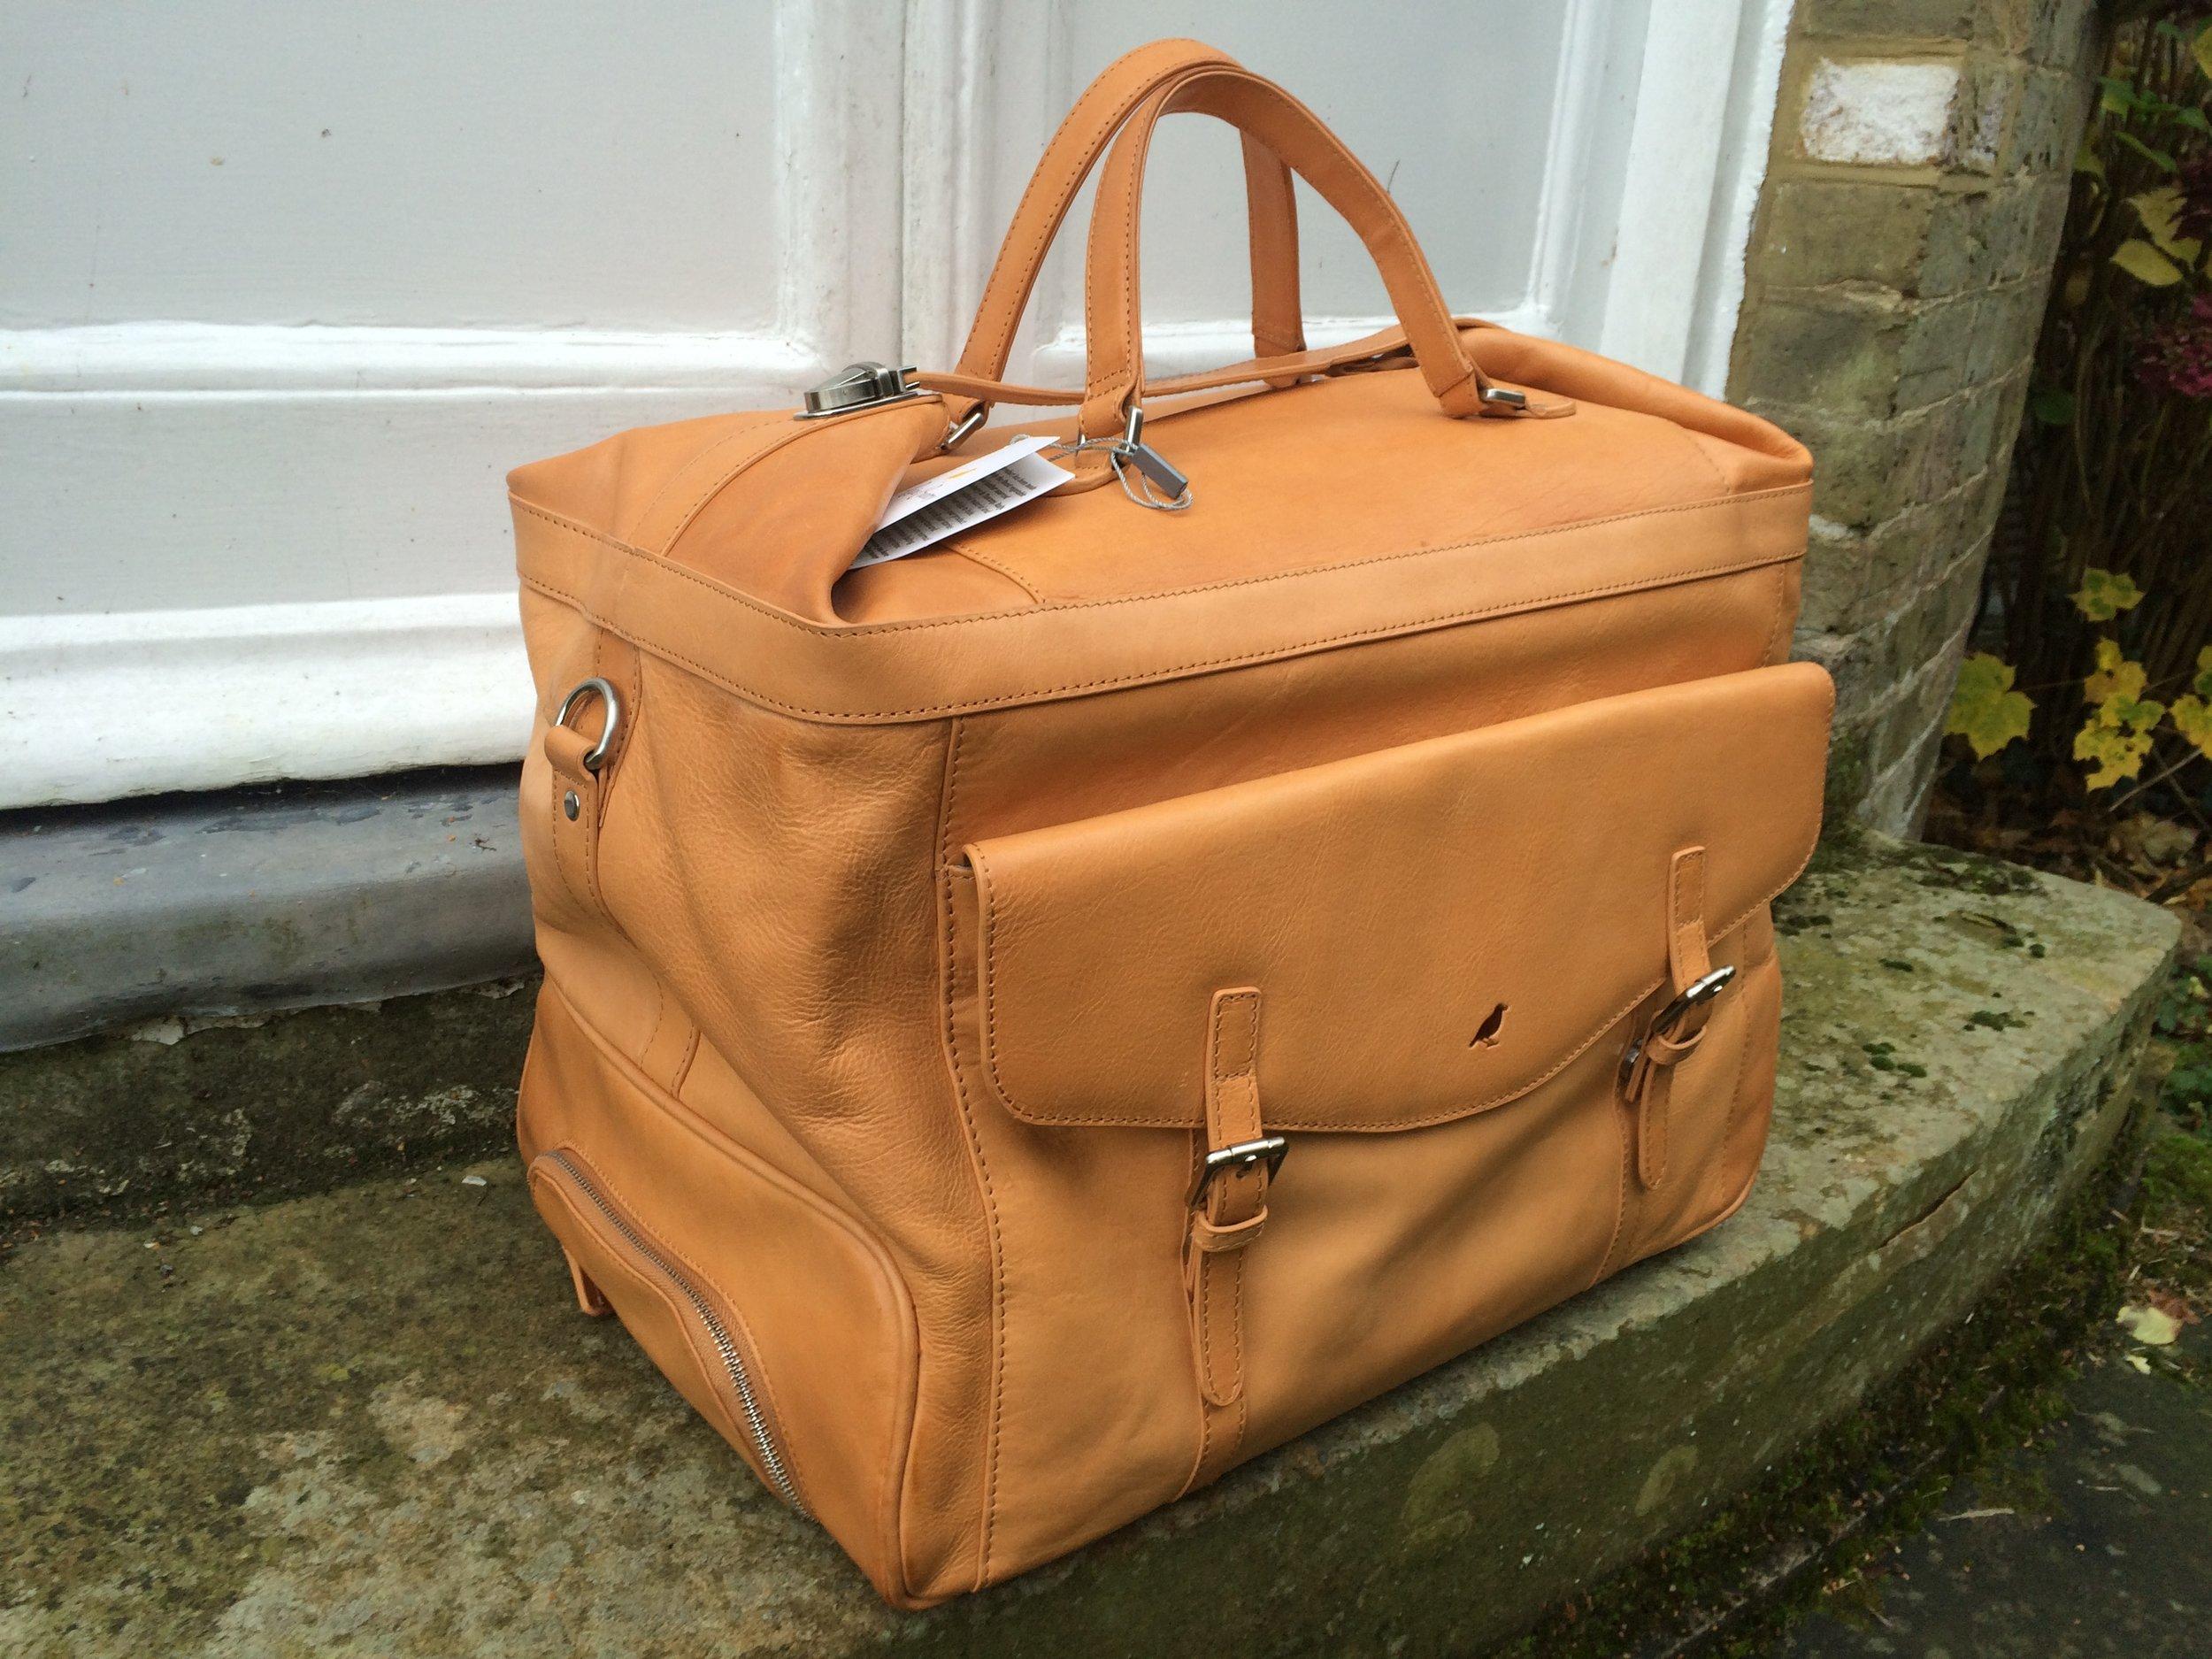 Bespoke Travel Bags